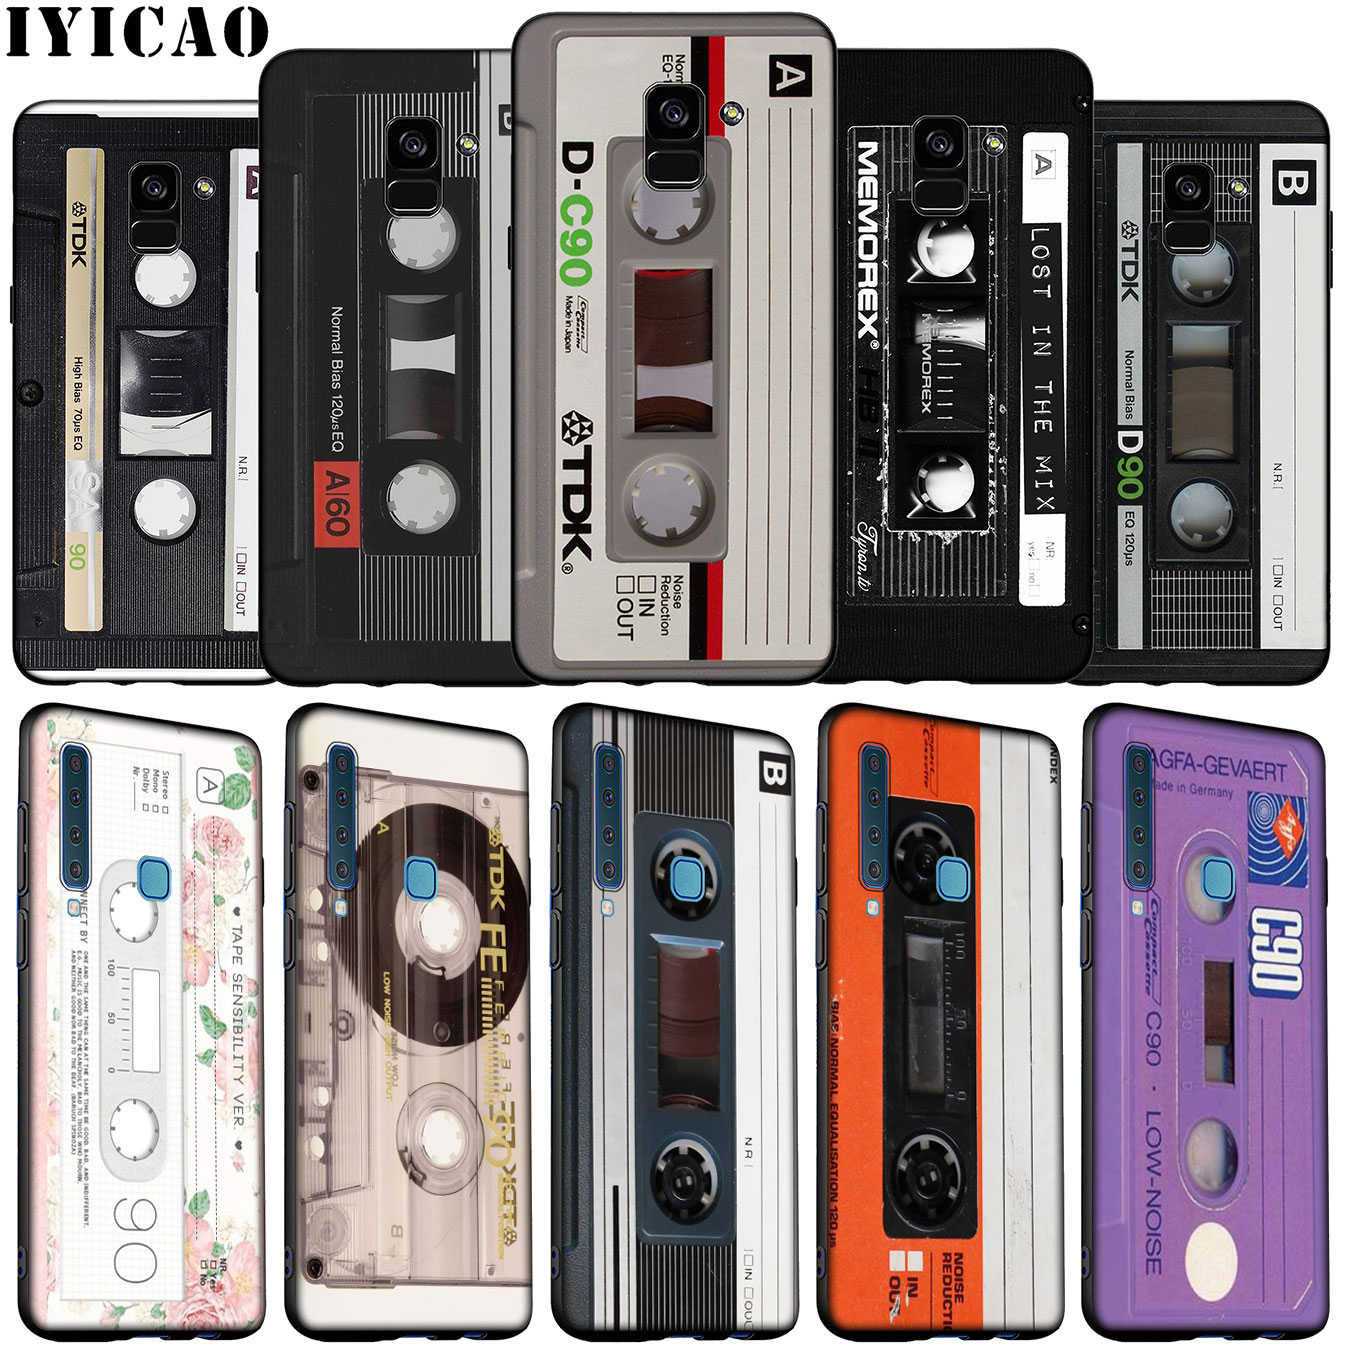 IYICAO cinta magnética Cassette cinta de audio de silicona suave funda para Samsung Galaxy A6 A9 A8 A7 2018 A3 A5 2016 NOTA DE 2017 9 8 10 Plus